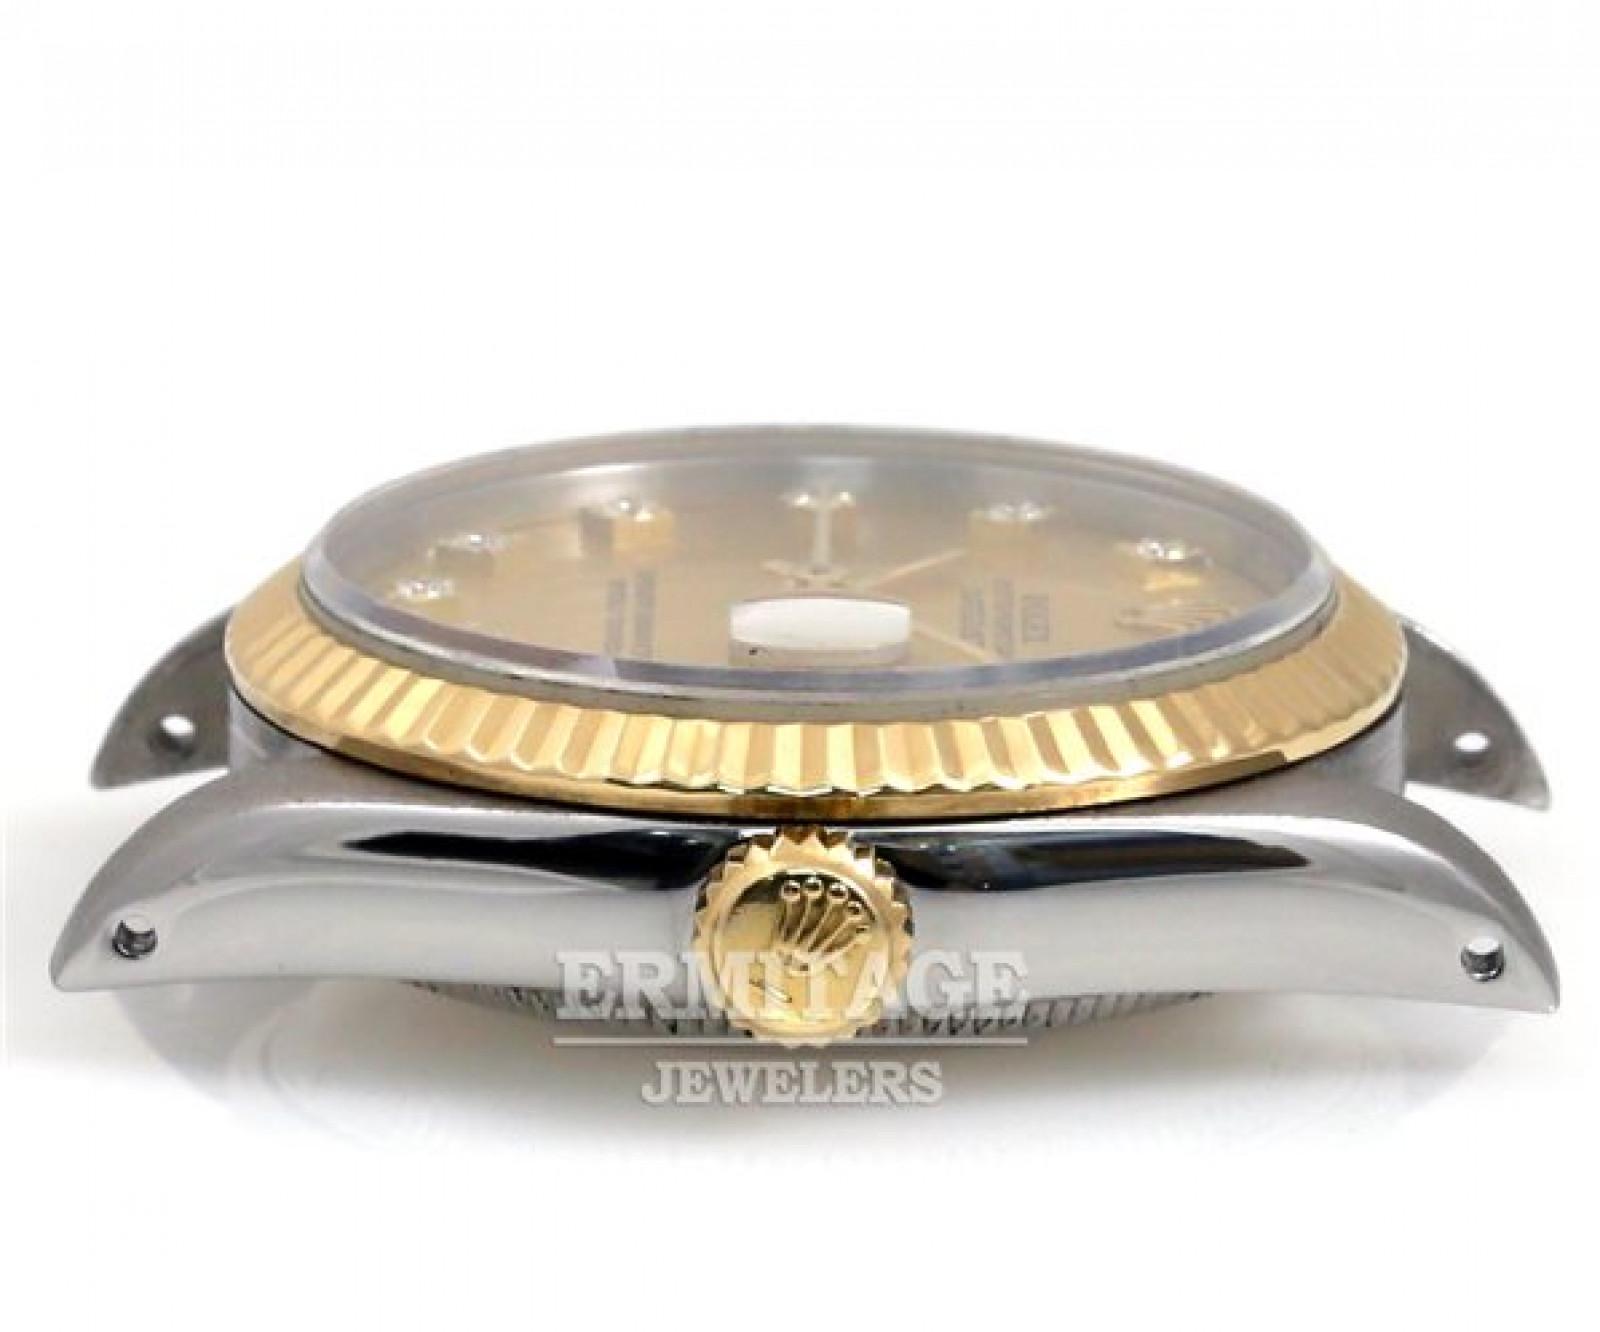 Champagne Diamond Dial Rolex Datejust 68273